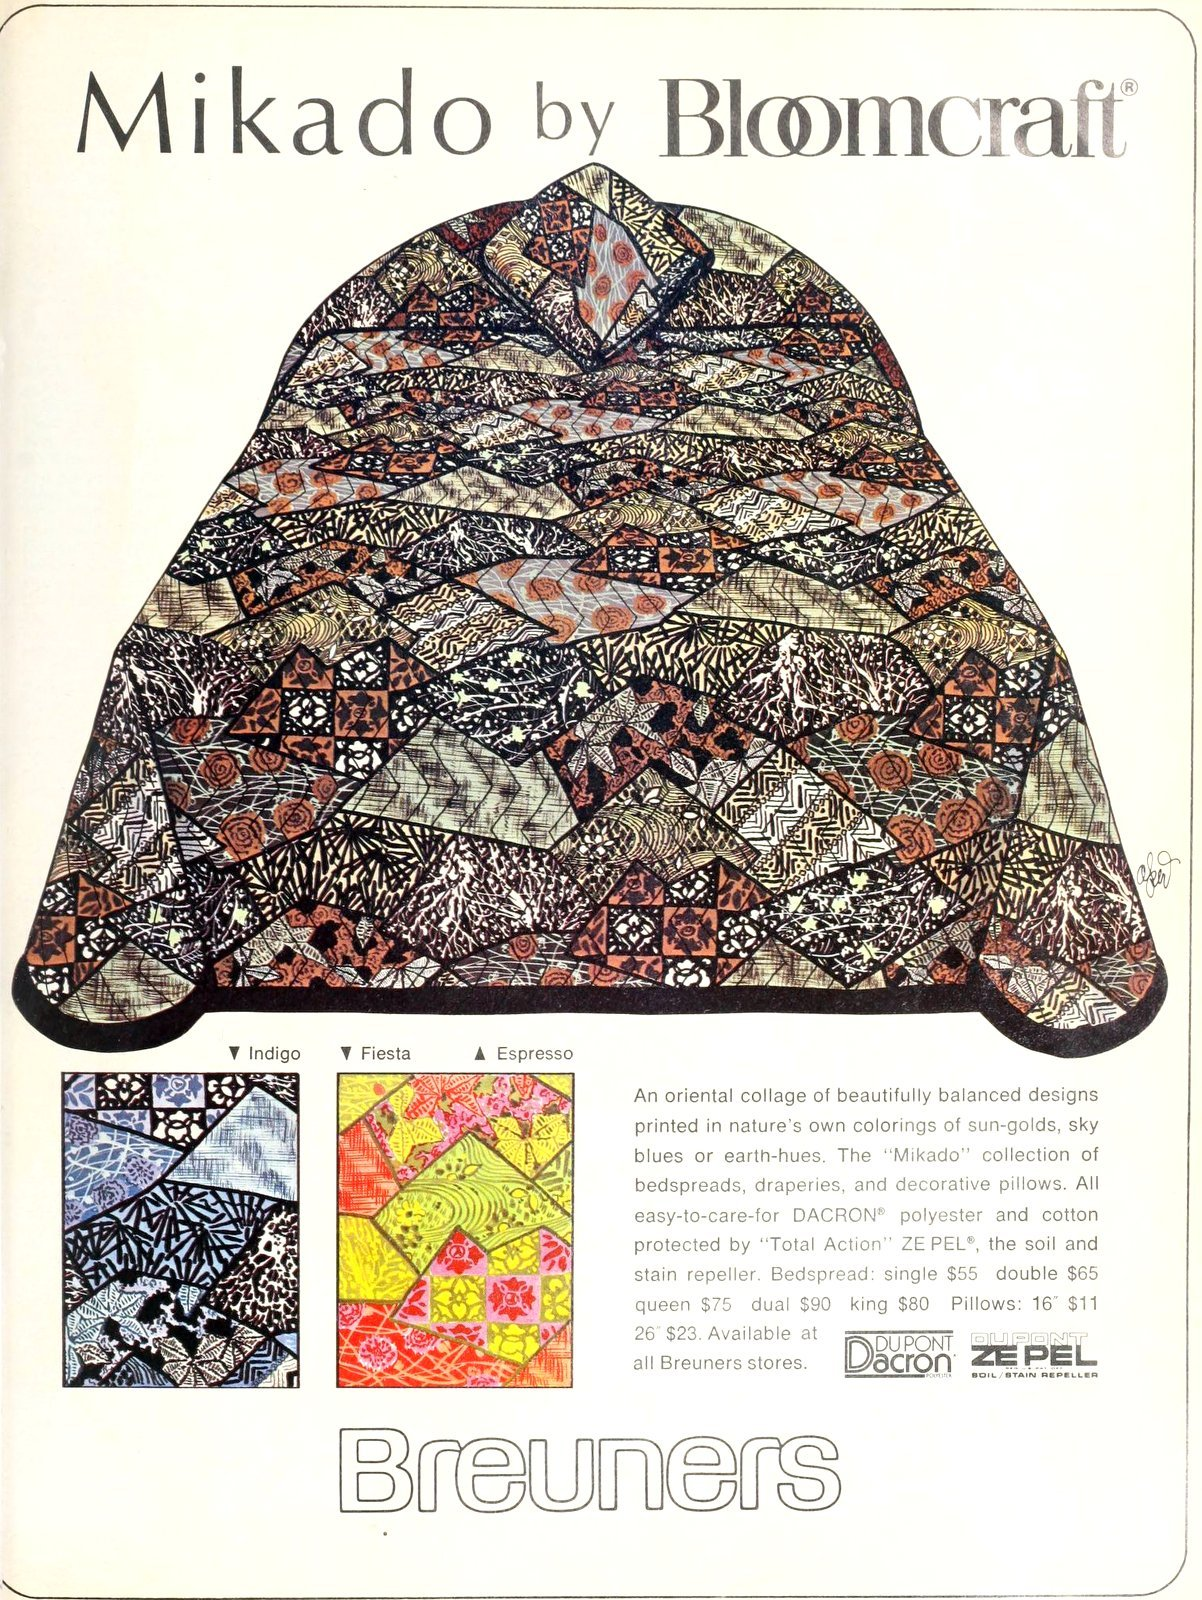 Mikado by Bloomcraft vintage bedspreads at Breuners (1974)